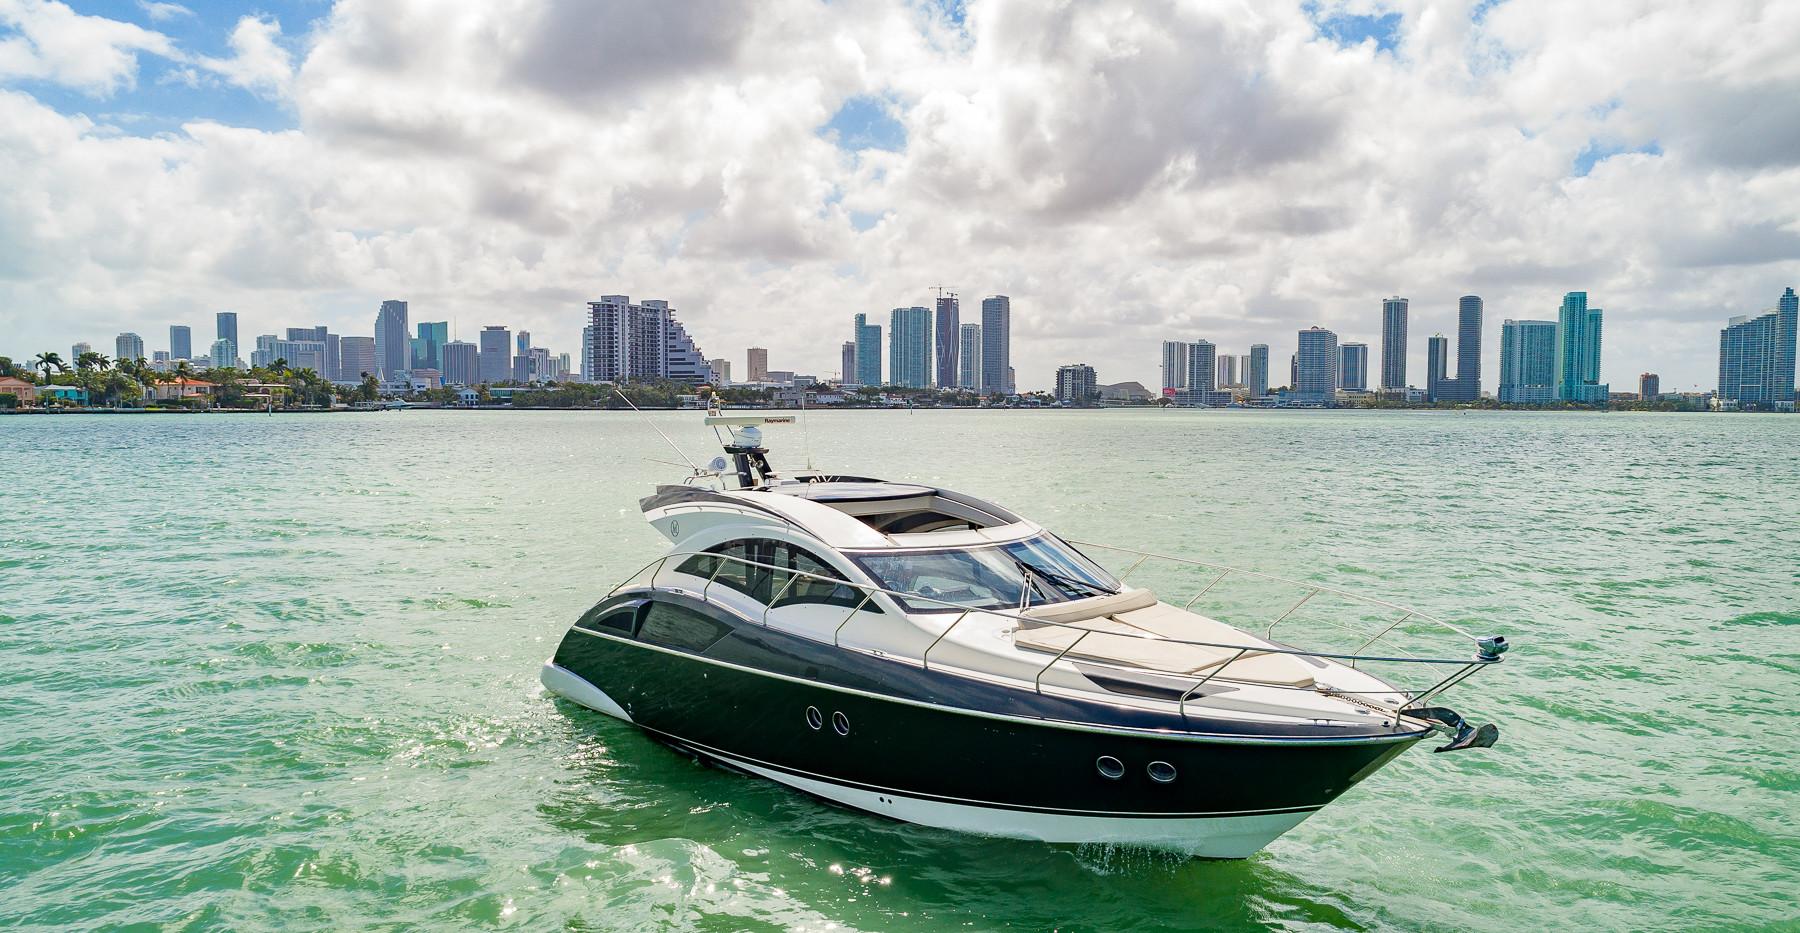 43-marquis-yacht-image-09.jpg